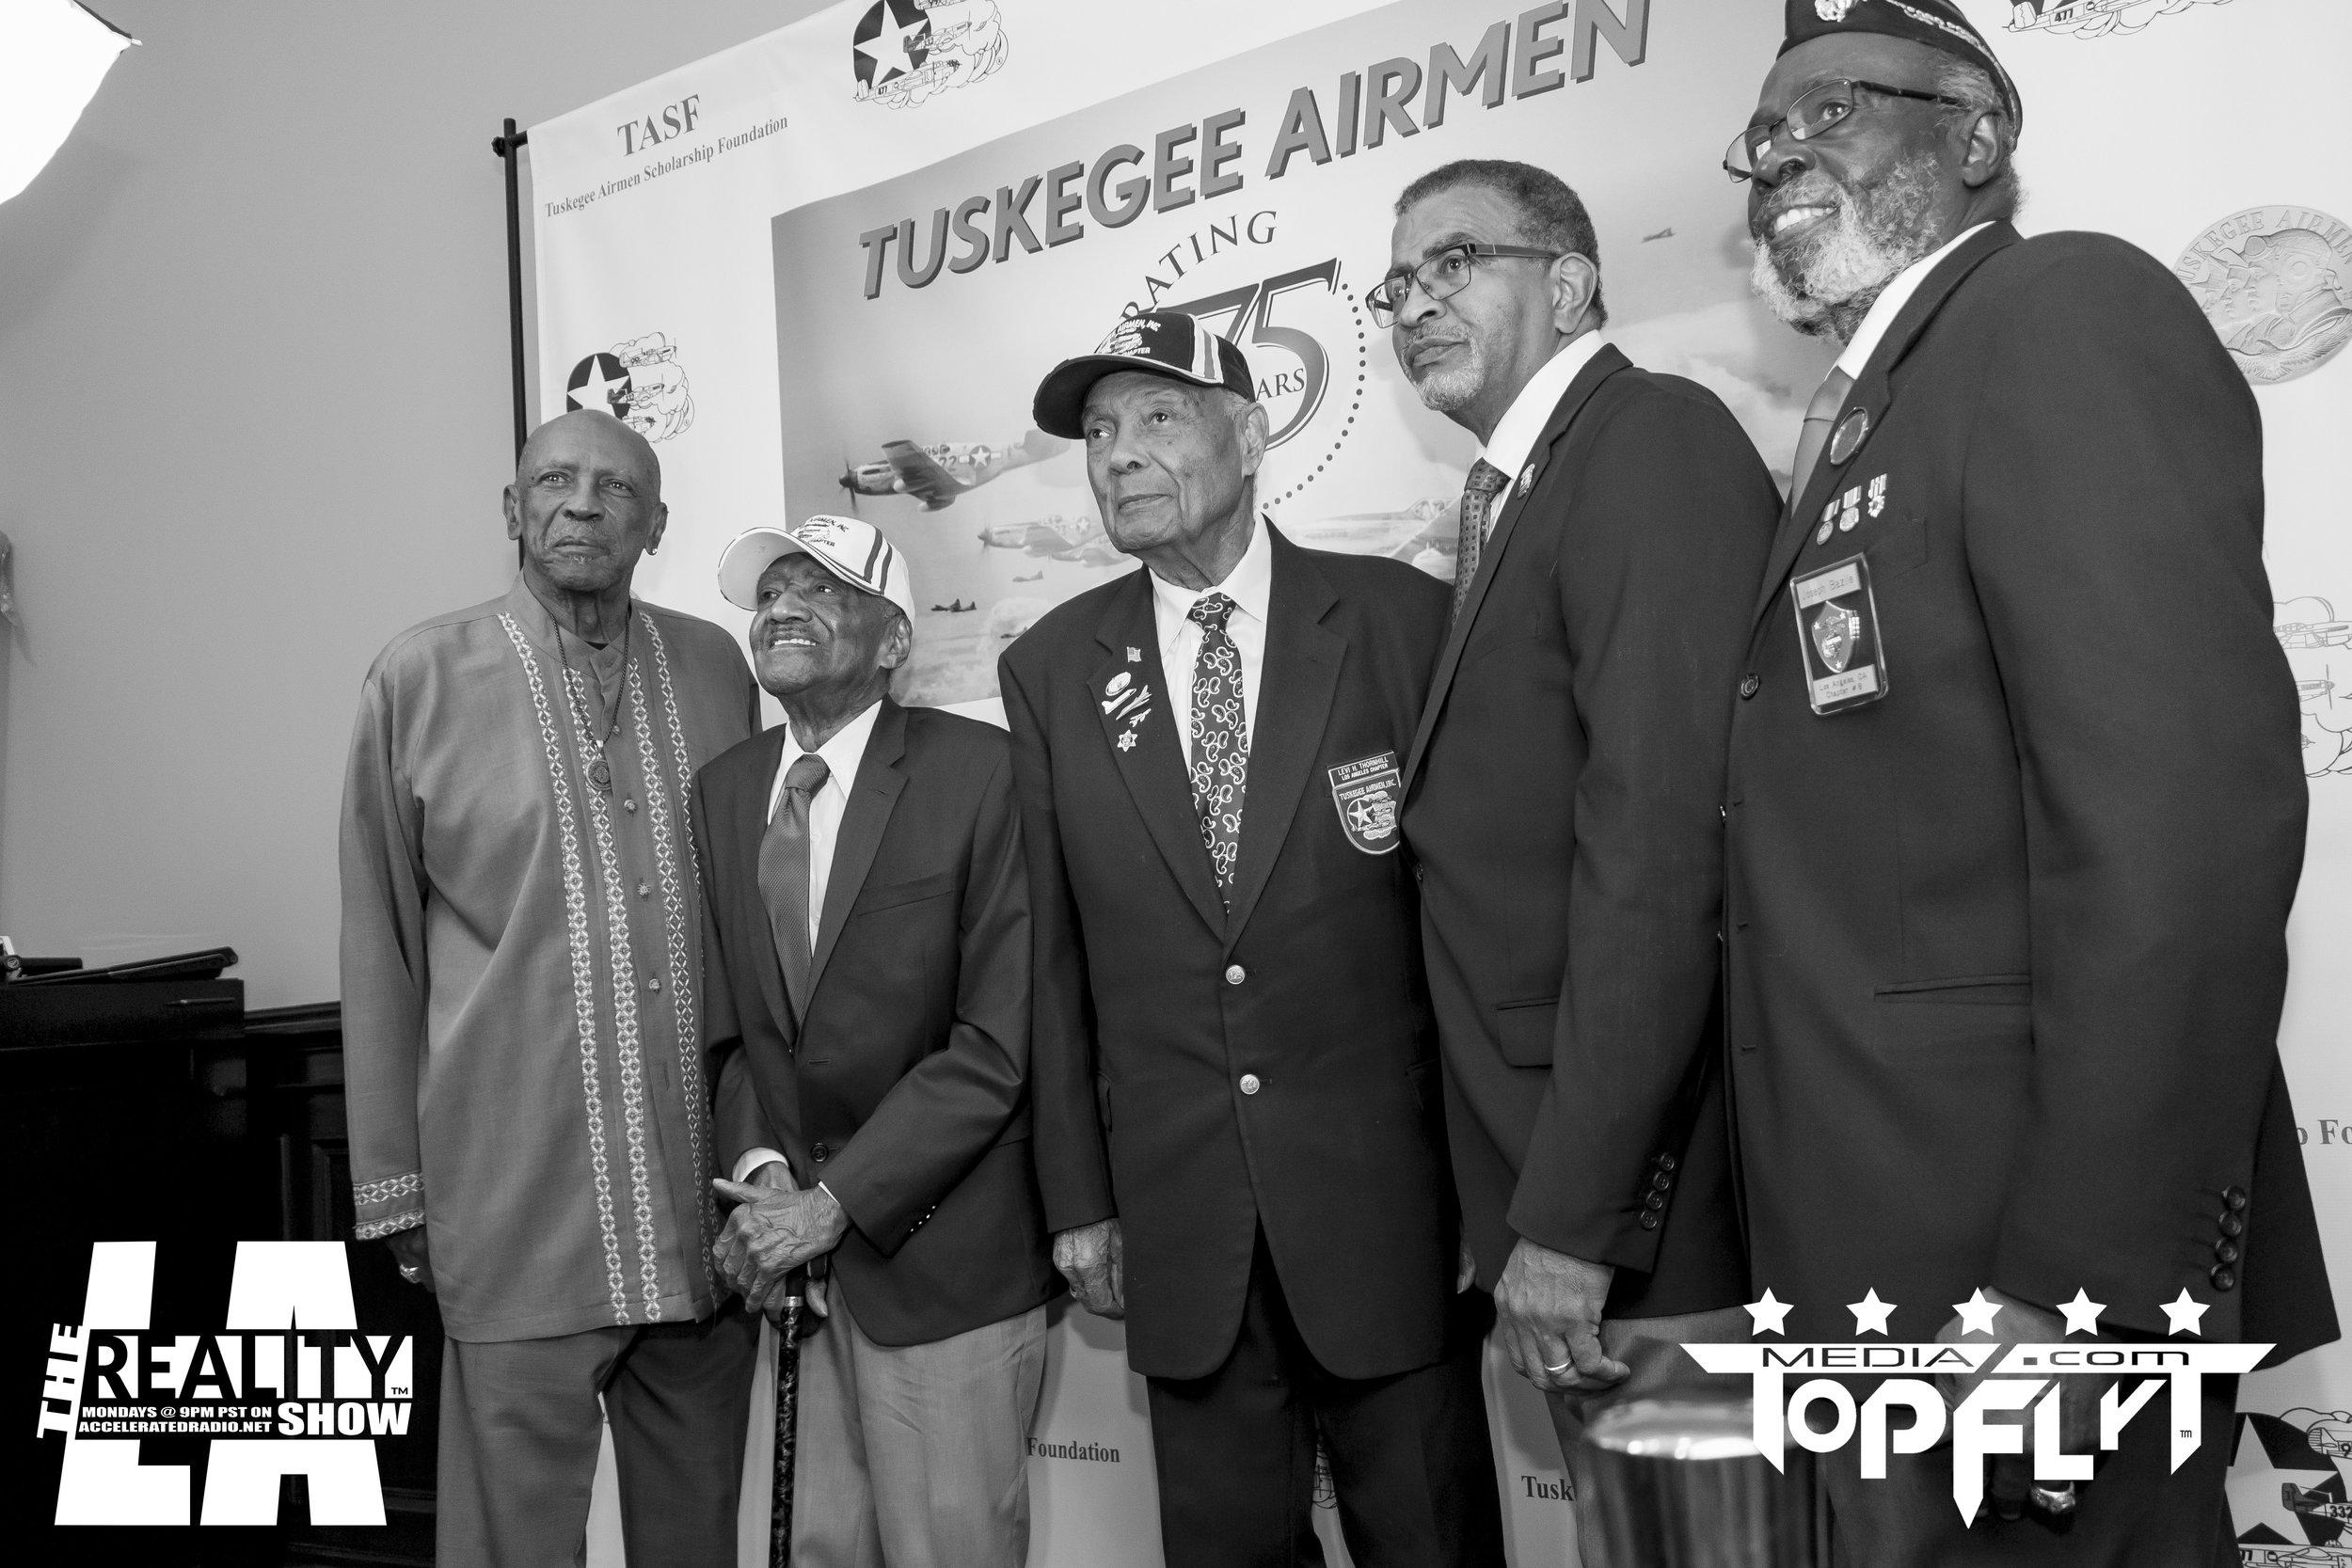 The Reality Show LA - Tuskegee Airmen 75th Anniversary VIP Reception_24.jpg